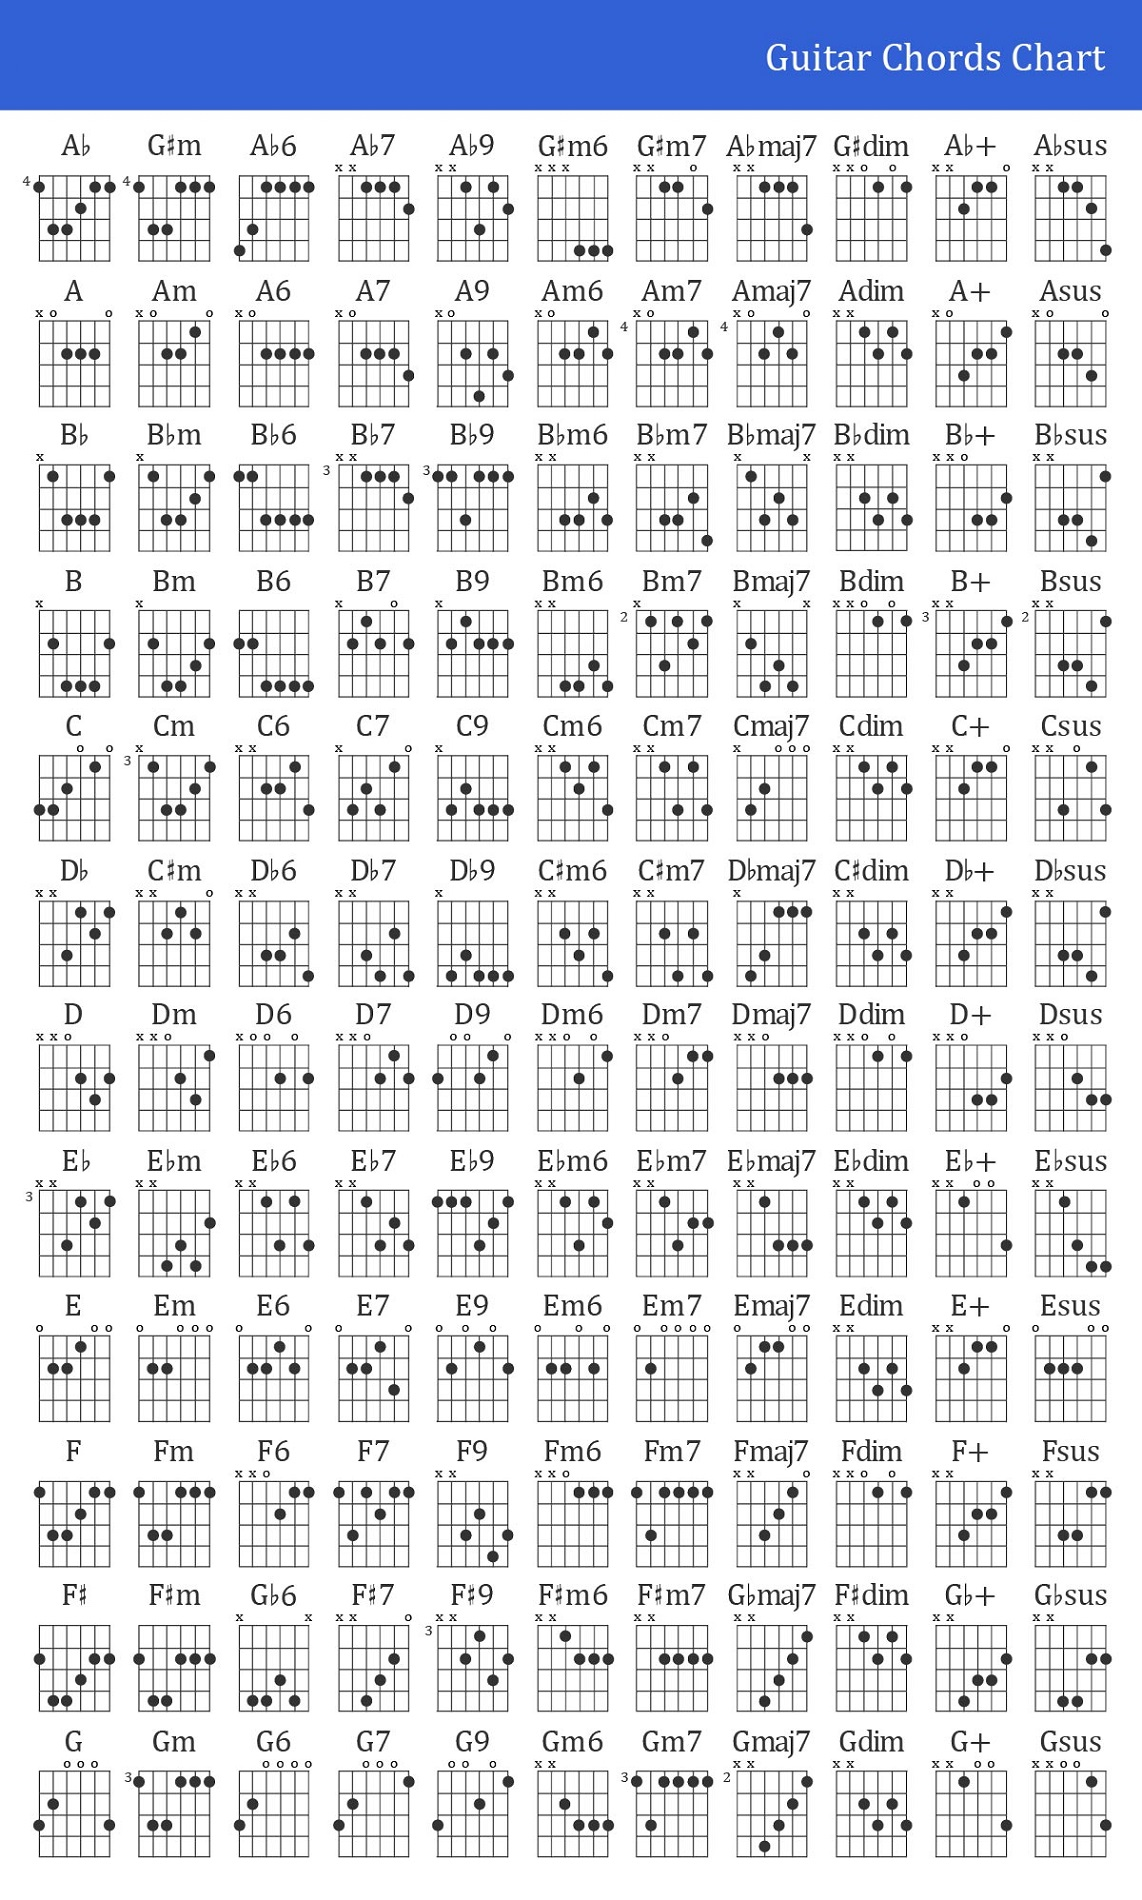 Guitar Chords Guide